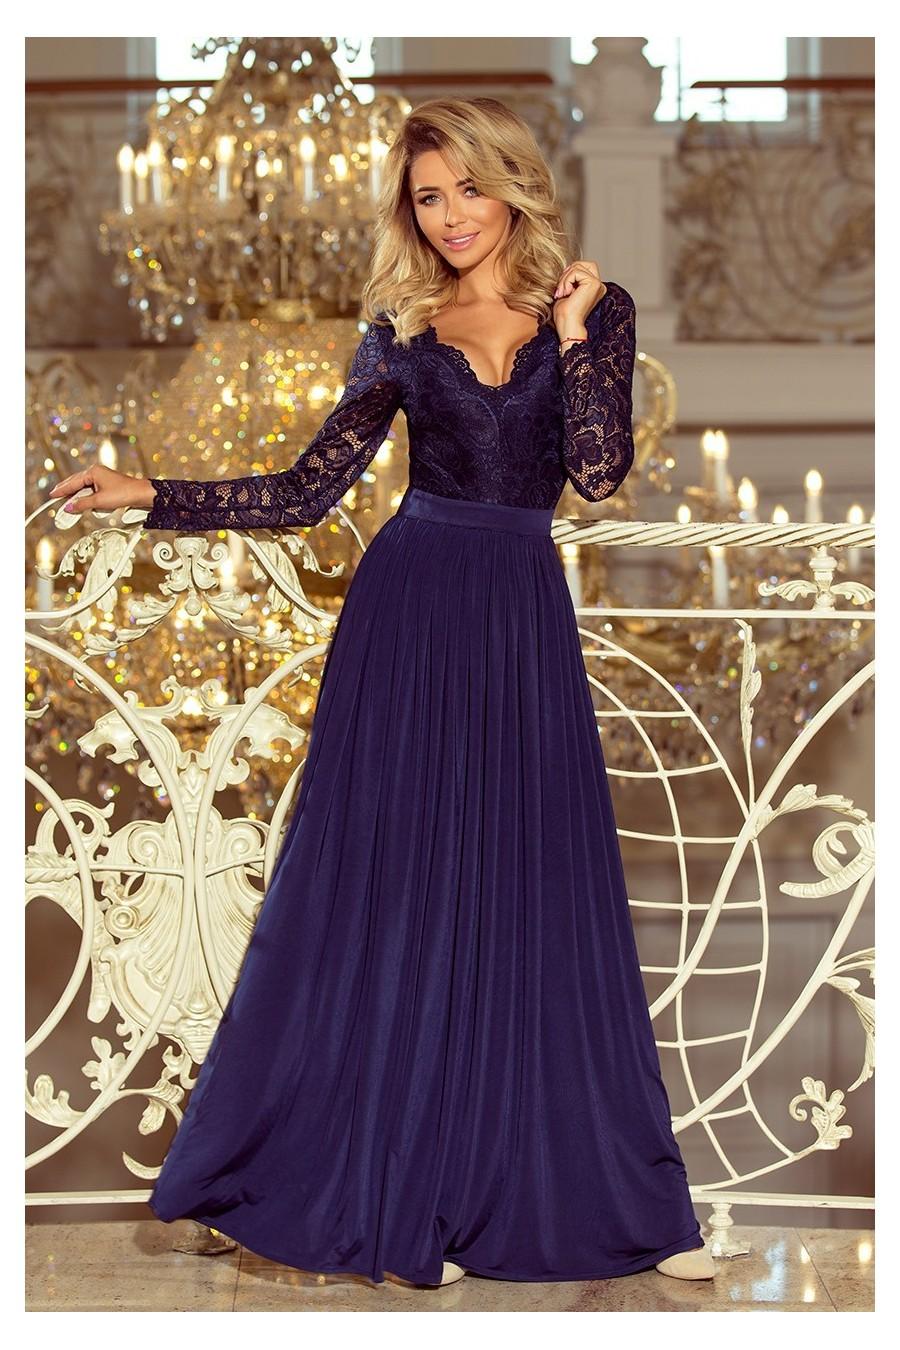 0d2c3e222a1d Nádherné spoločenské šaty s rukávom 3283 - Spoločenské šaty Online